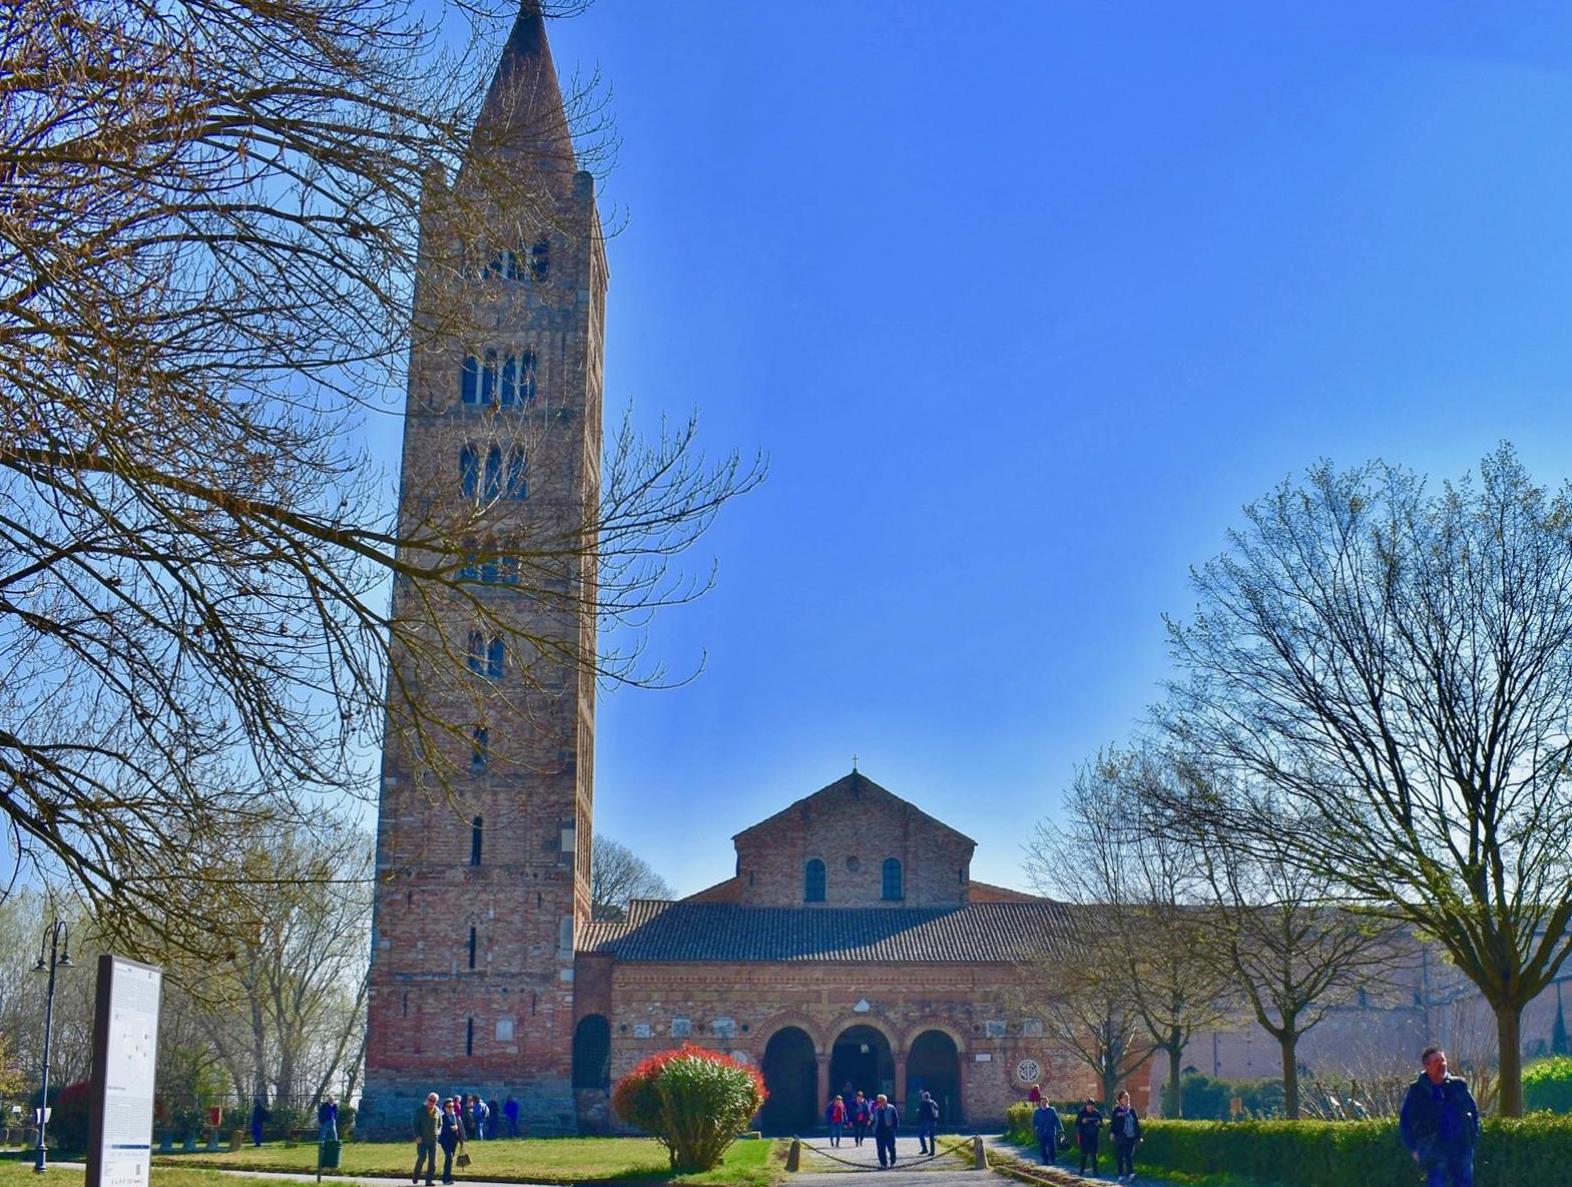 The abbey of Pomposa (Ferrara)